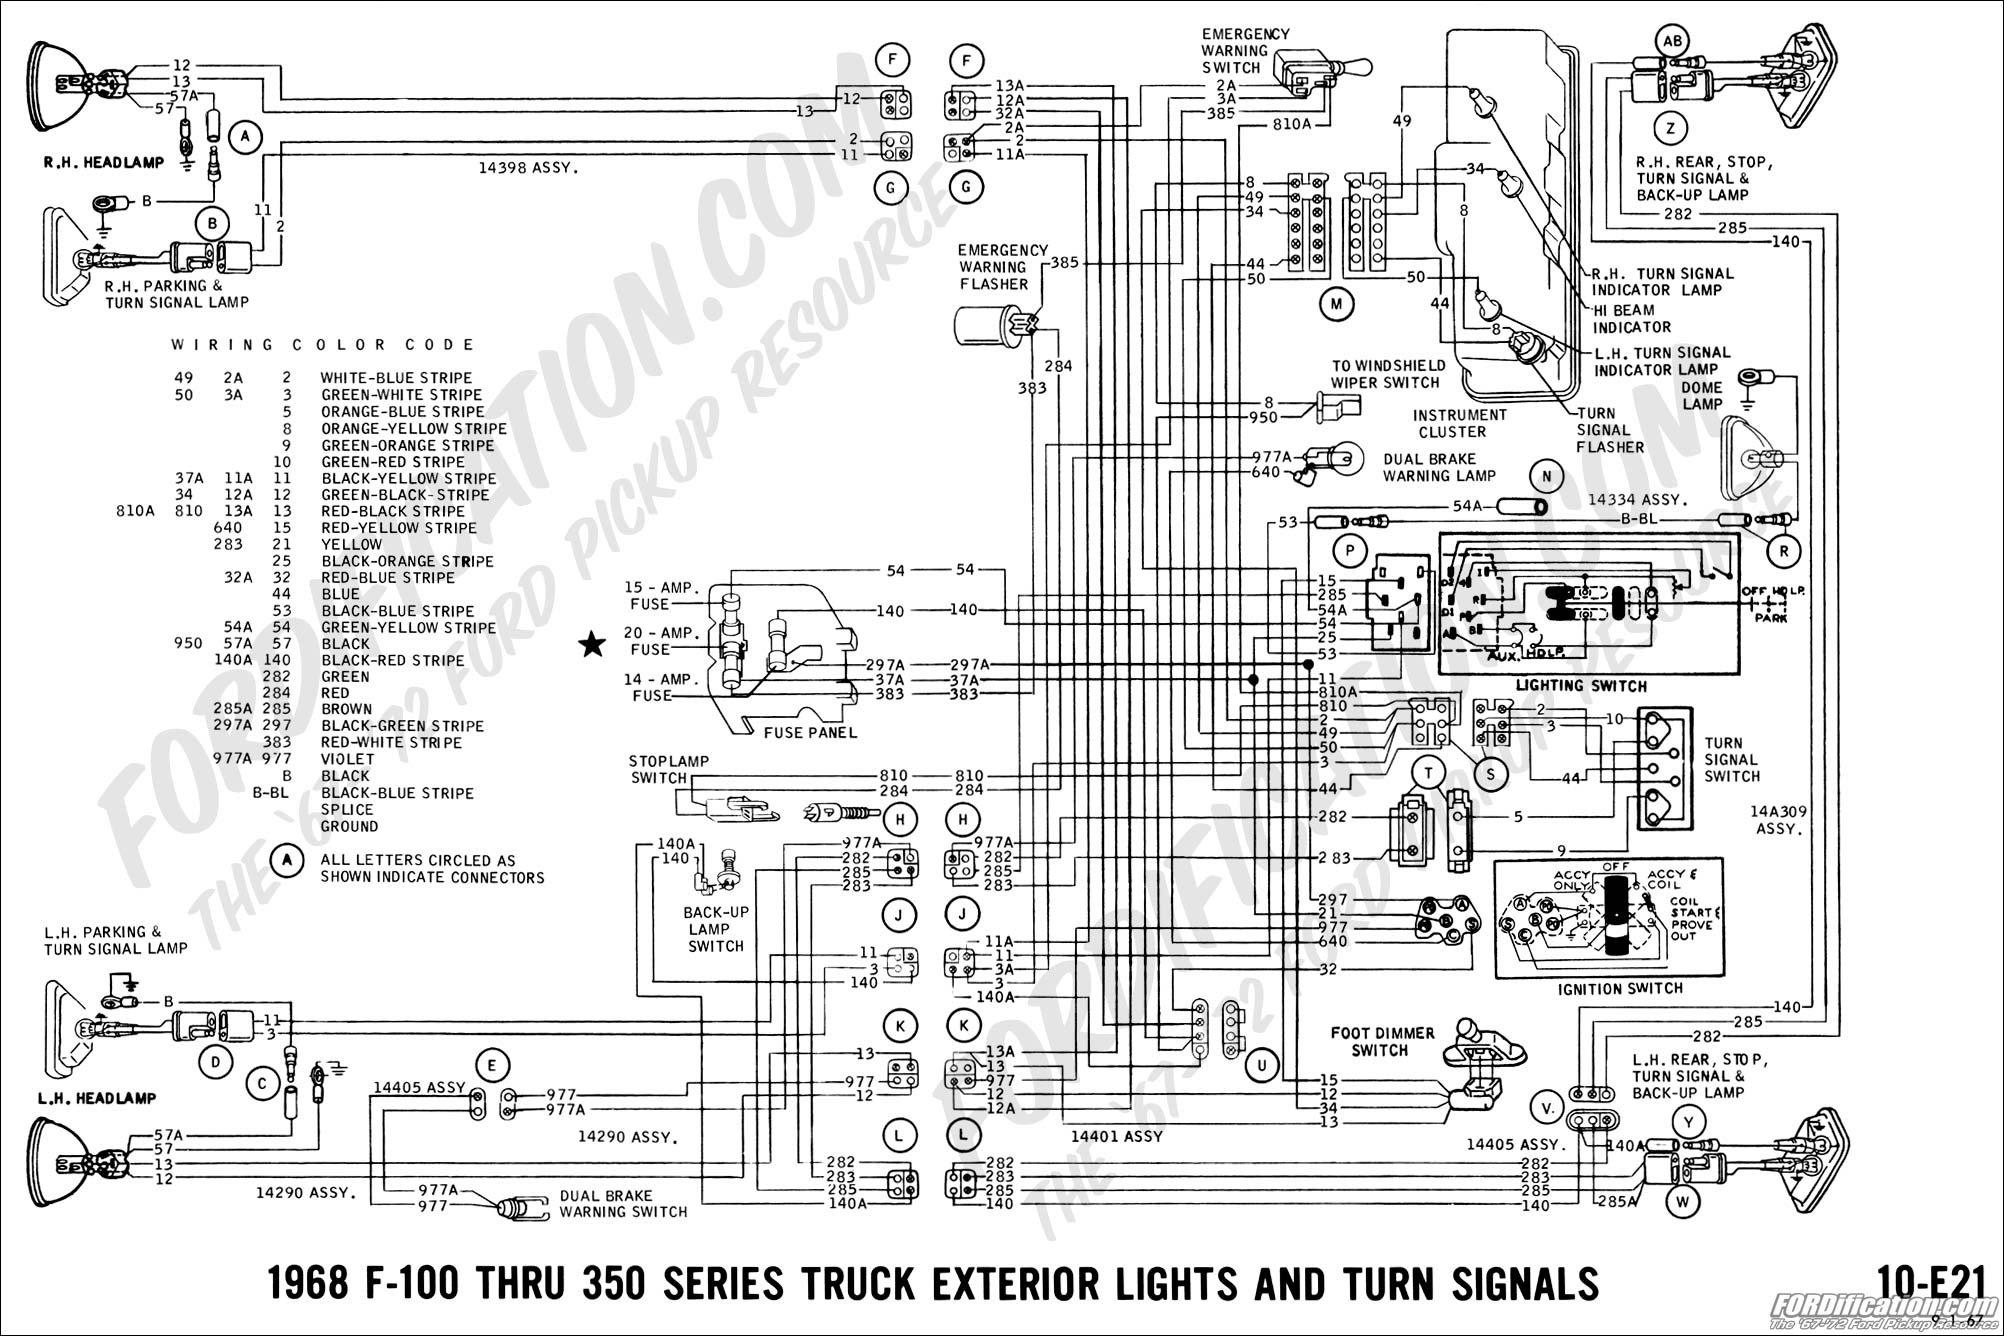 Harley Turn Signal Wiring Diagram | Free Wiring Diagram on harley switch diagram, harley relay diagram, harley shift linkage diagram, harley wiring color codes, harley dash wiring, harley evo diagram, harley headlight diagram, harley wiring tools, harley magneto diagram, harley softail wiring harness, harley rear axle diagram, harley panhead wiring, harley generator diagram, harley stator diagram, harley fuel pump diagram, harley fuse diagram, harley fuel lines diagram, harley throttle cable diagram, harley frame diagram,